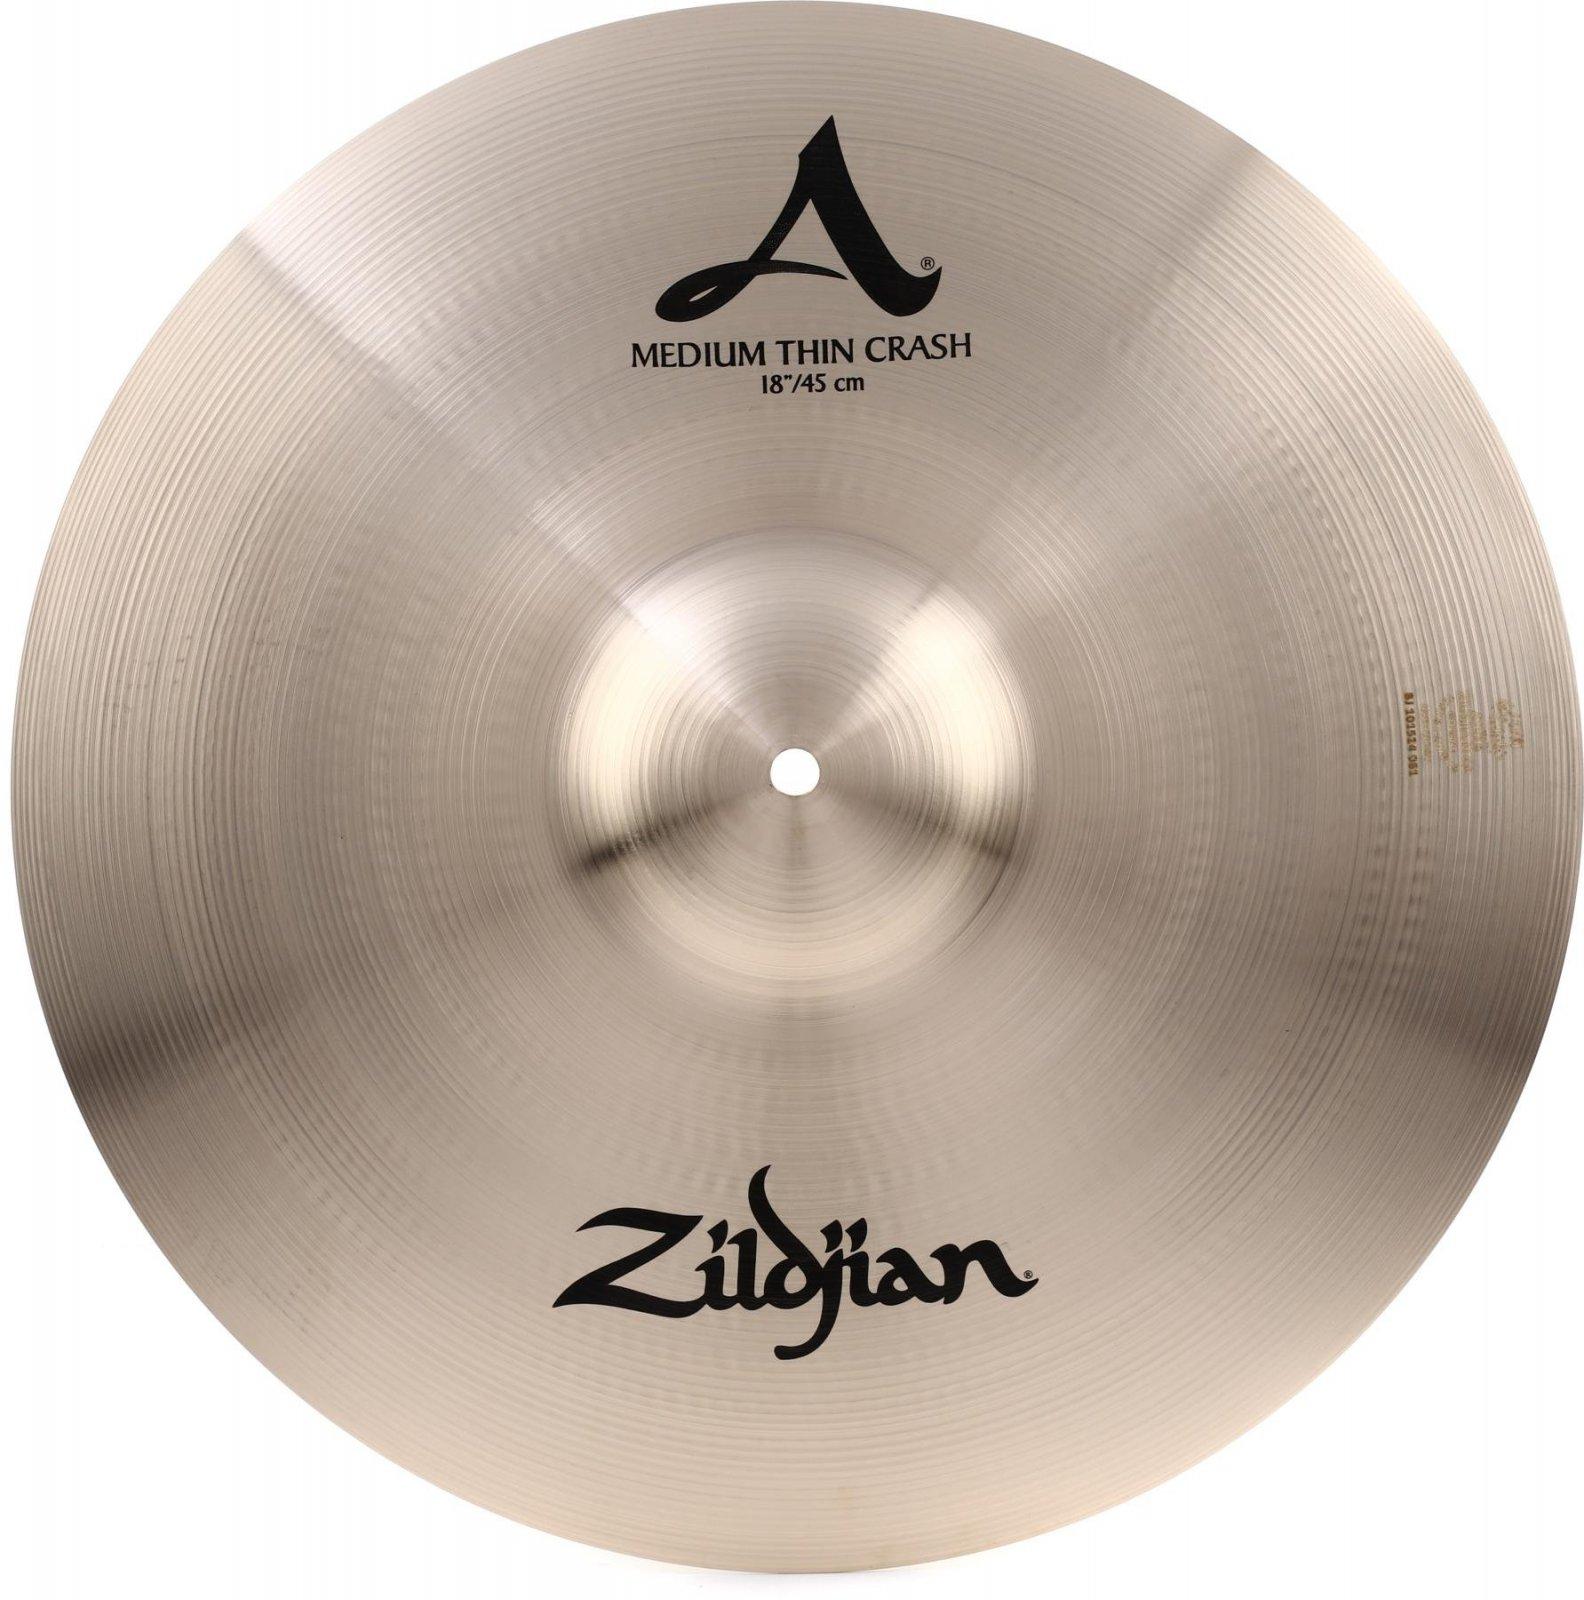 Zildjian A Series 18 Medium Thin Crash